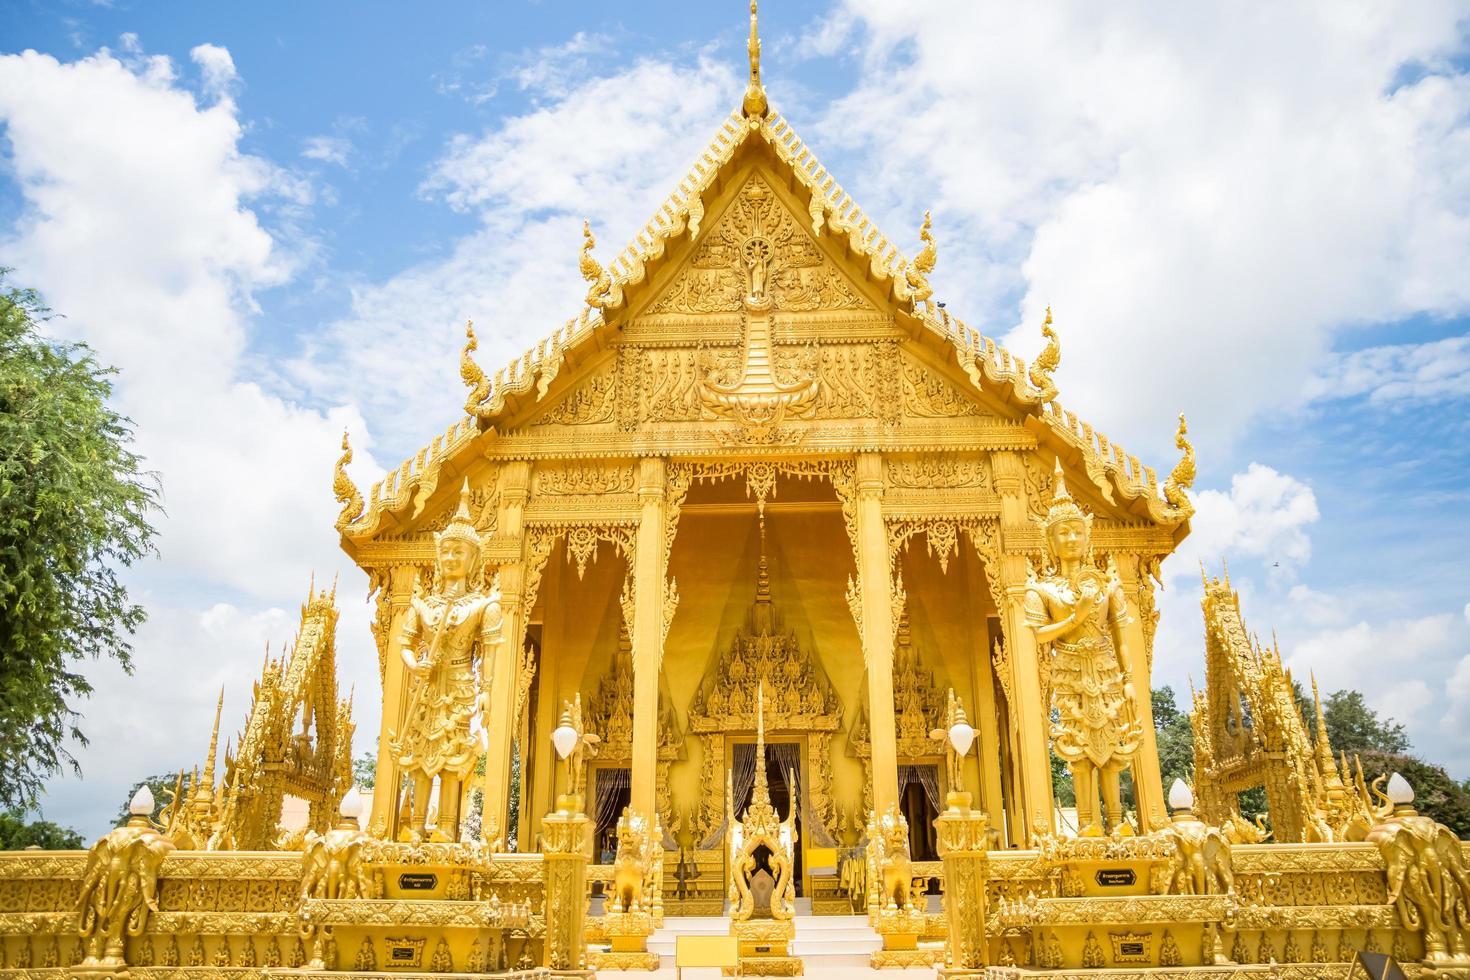 el templo dorado de wat paknam jolo, tailandia foto